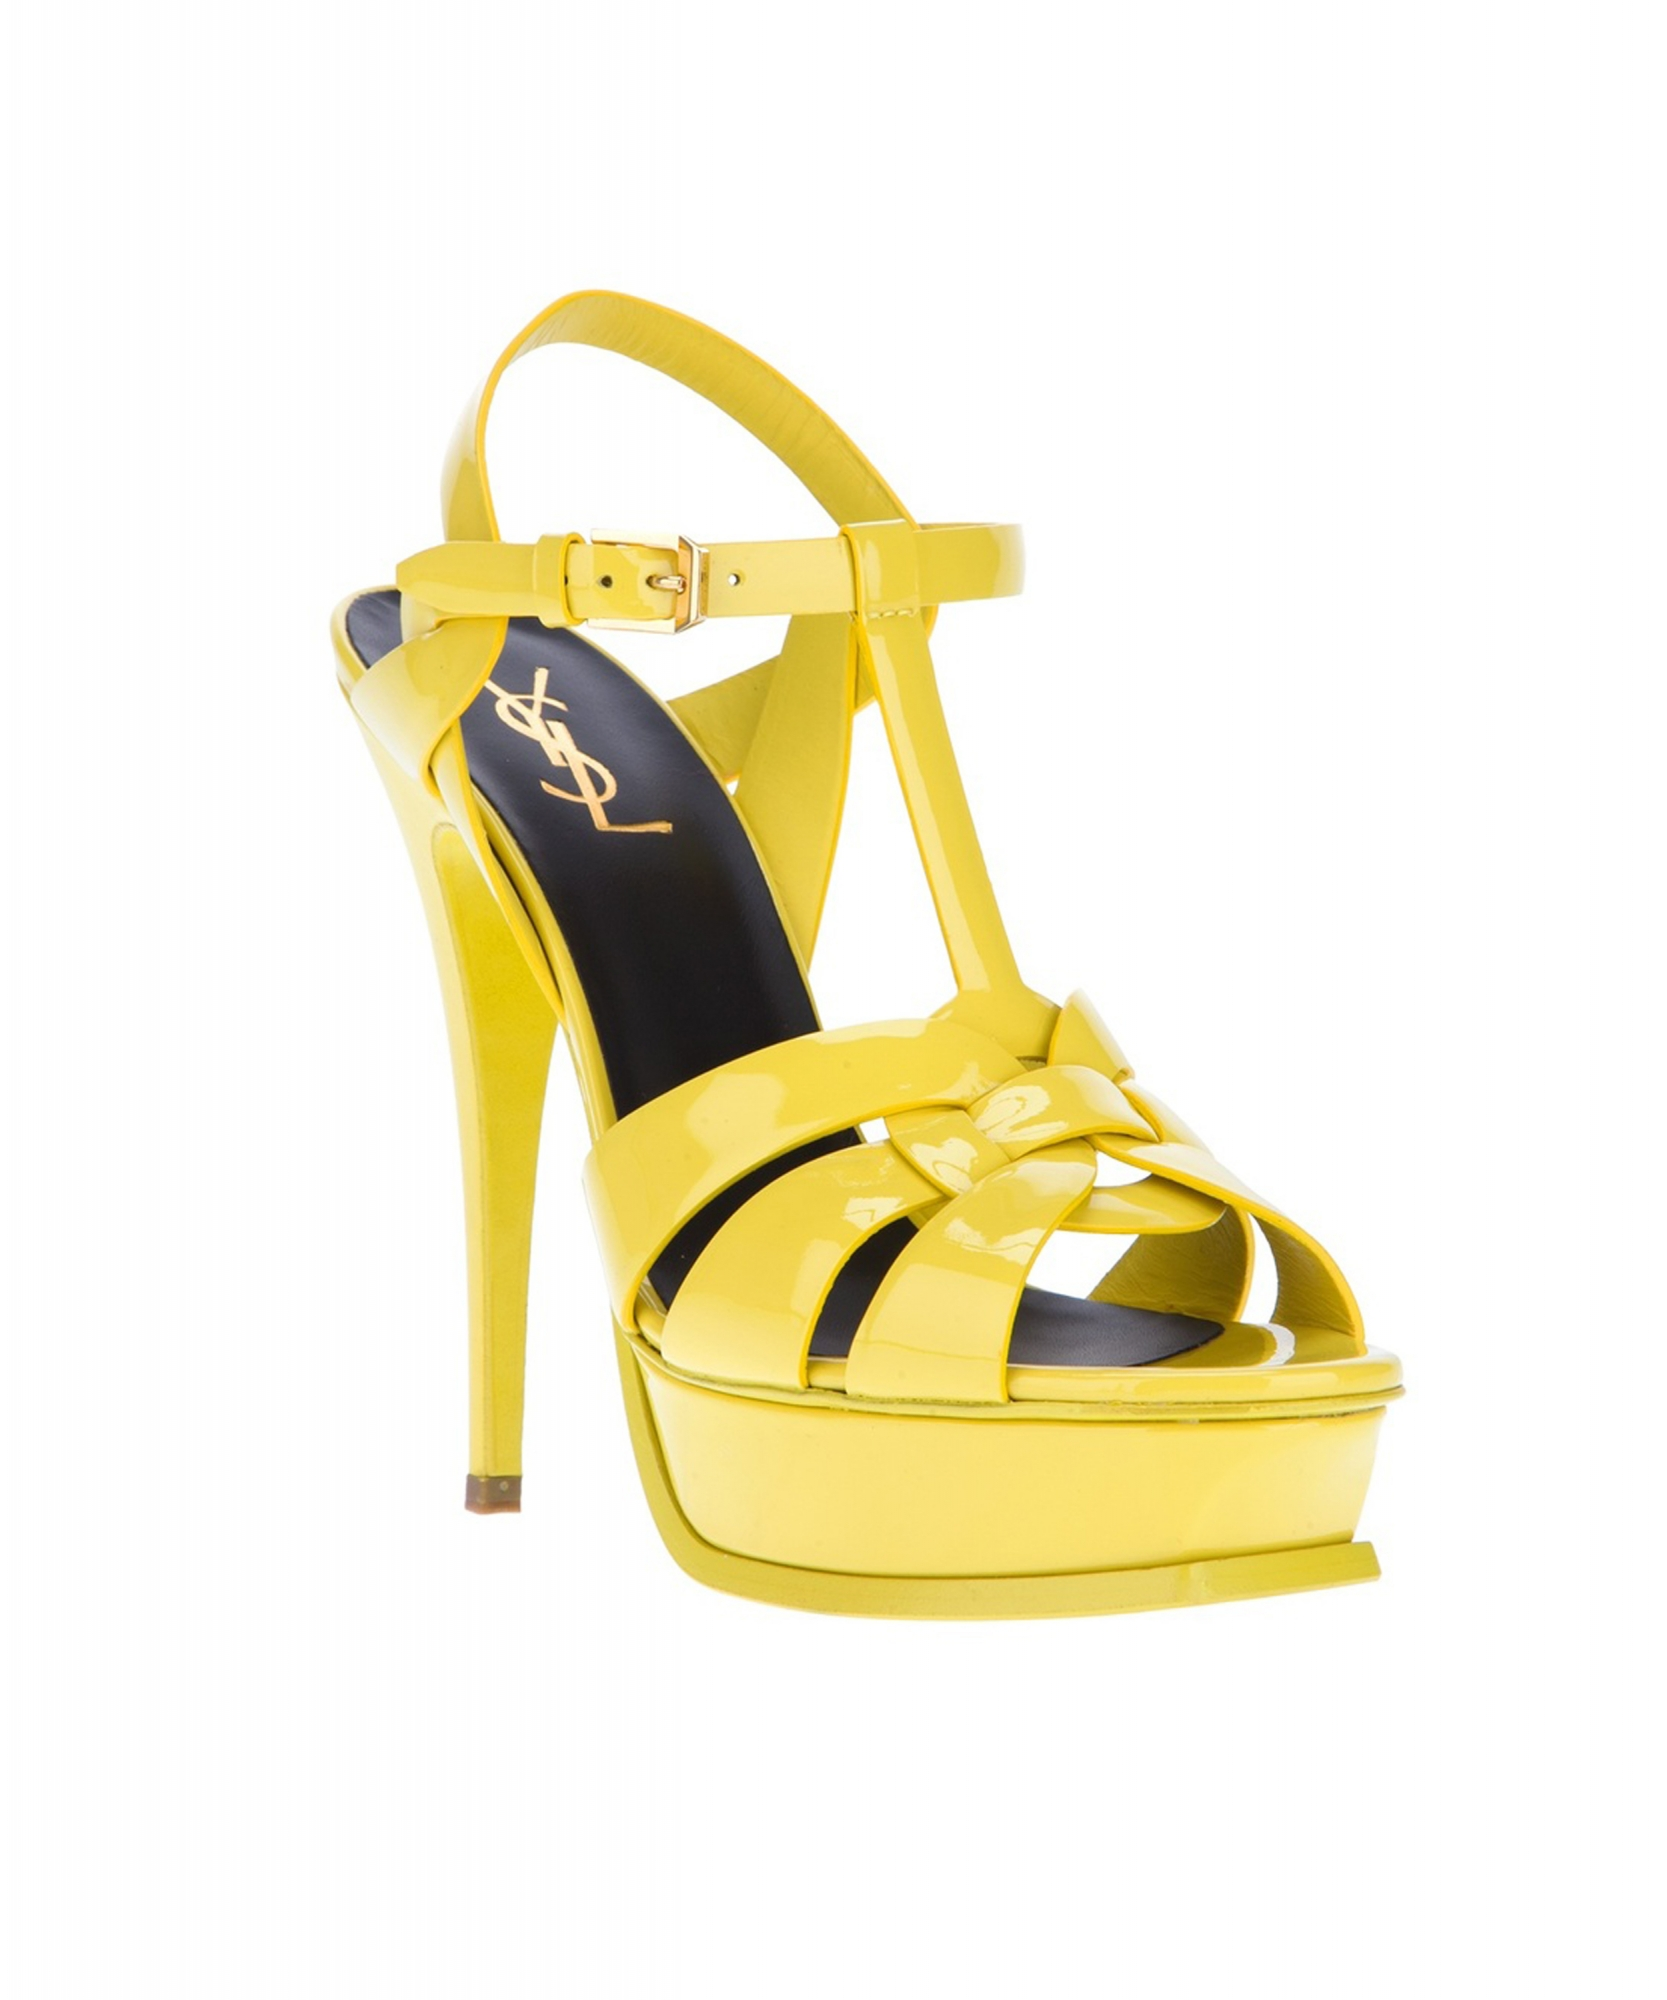 Saint Laurent Yellow Patent Leather Tribute Sandals